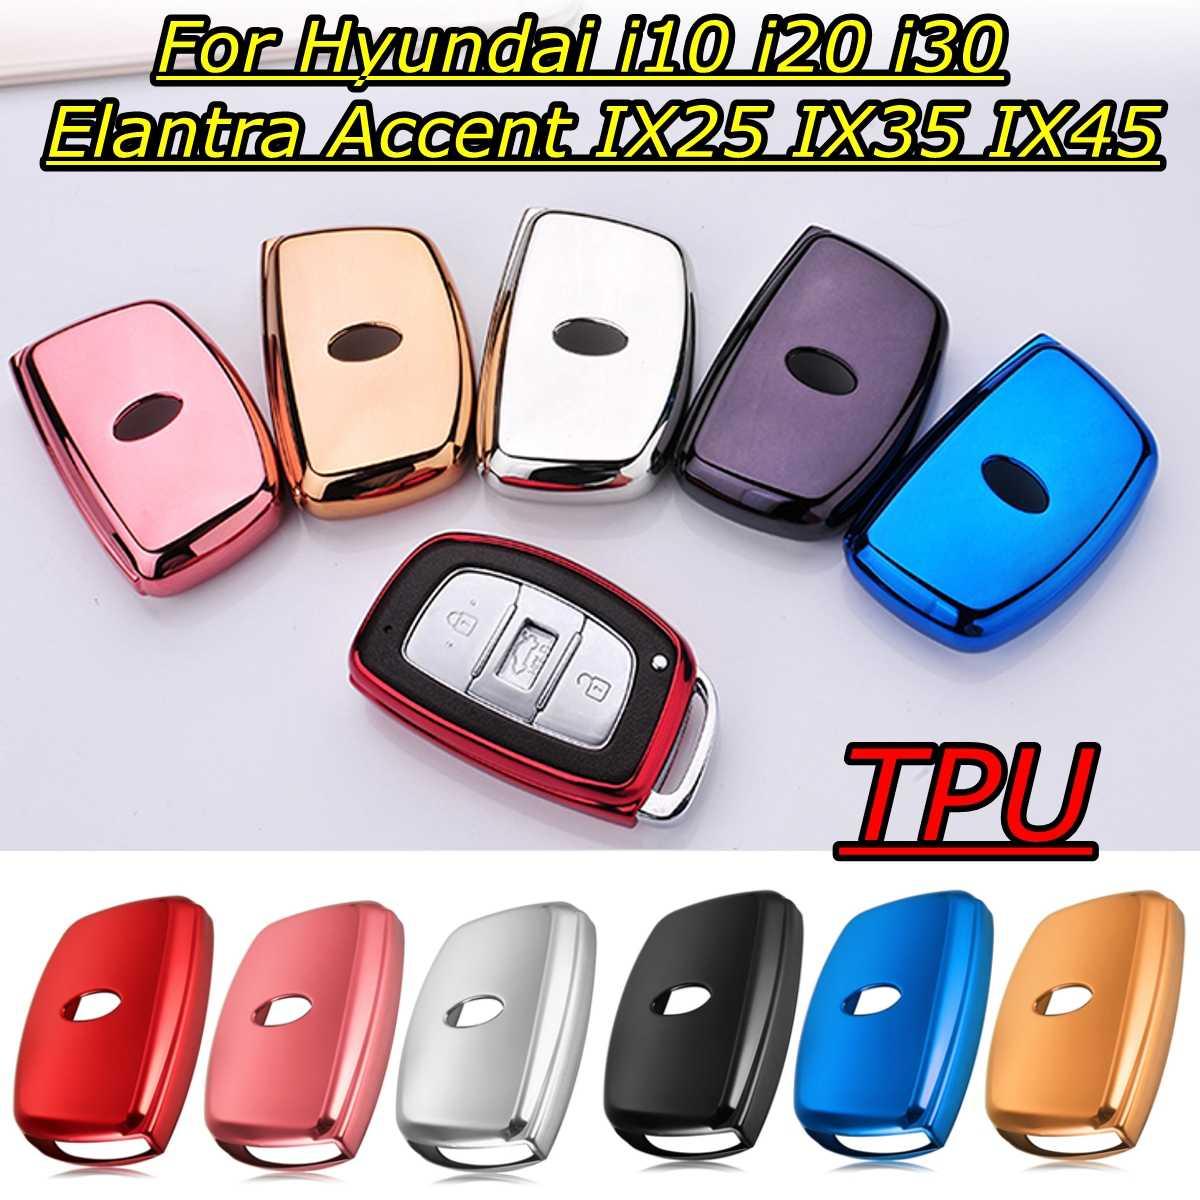 Tpu Car Key Cover For Hyundai I10 I20 I30 Elantra Accent IX25 IX35 IX45 Remote Protection Holder Styling Accessories Case  Shell